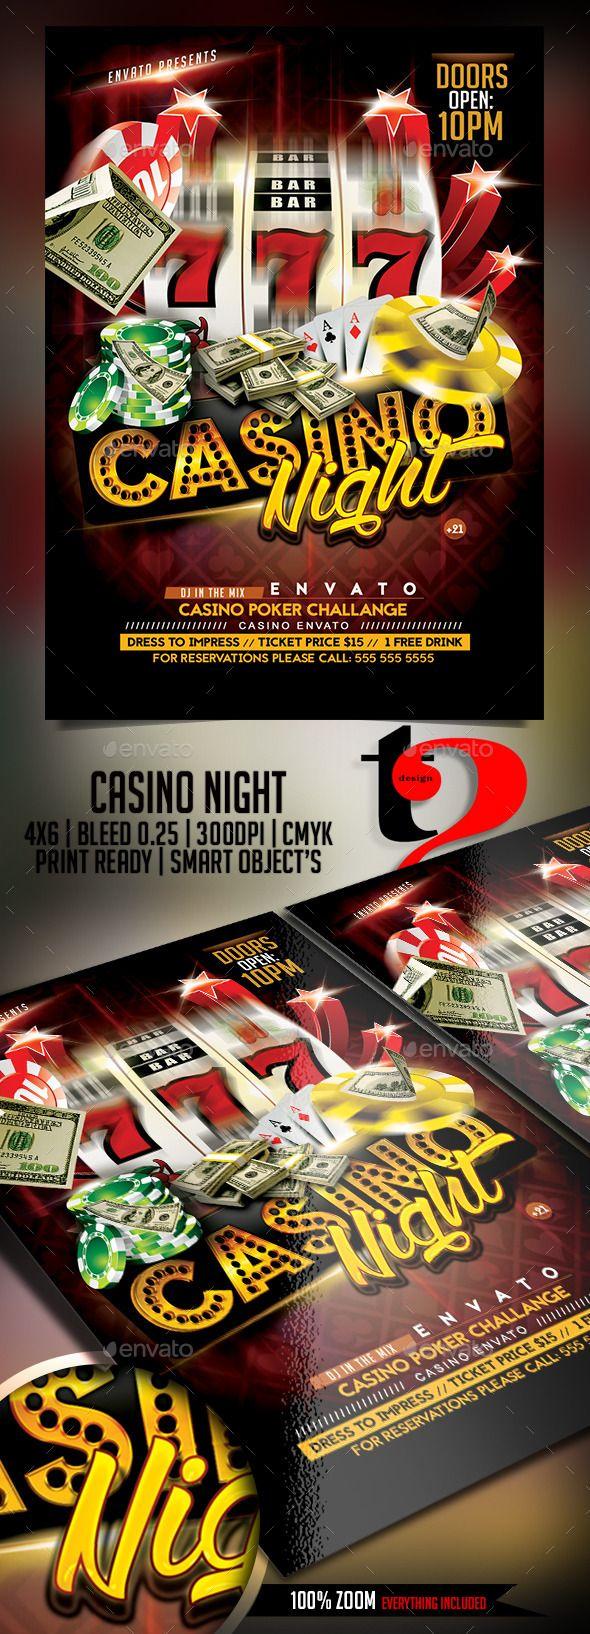 Casino Night Flyer Template | Casino Infographics